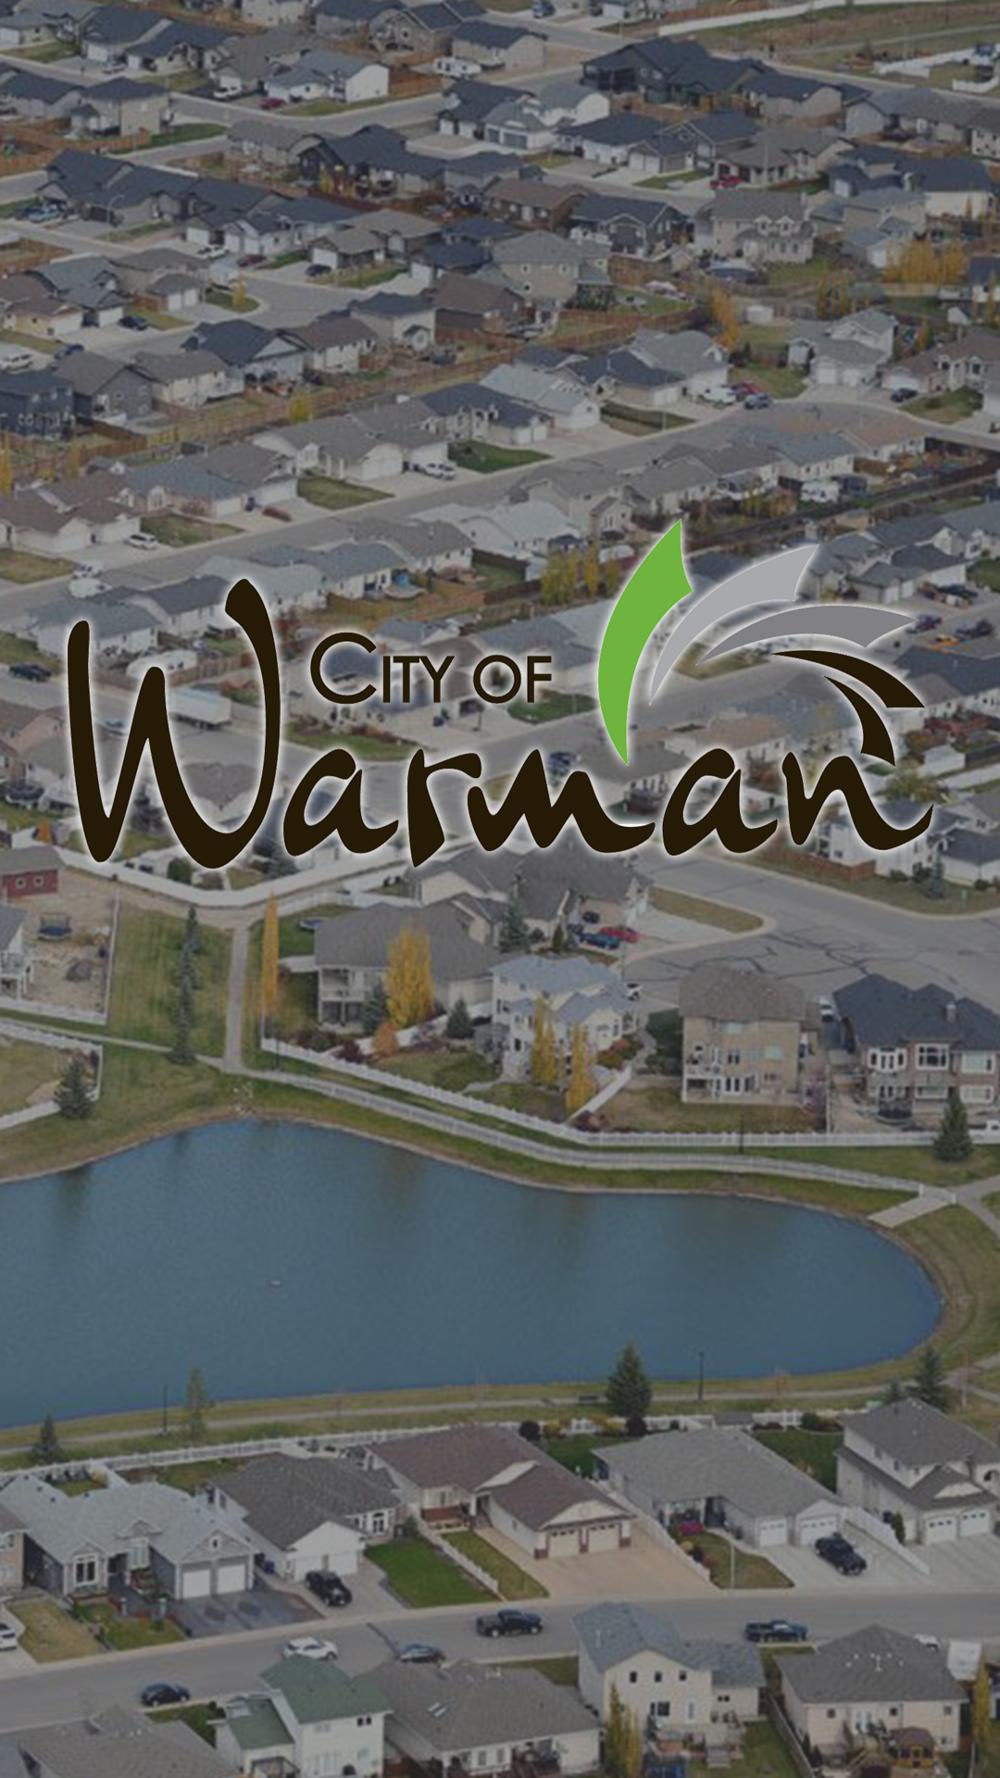 Warman.png